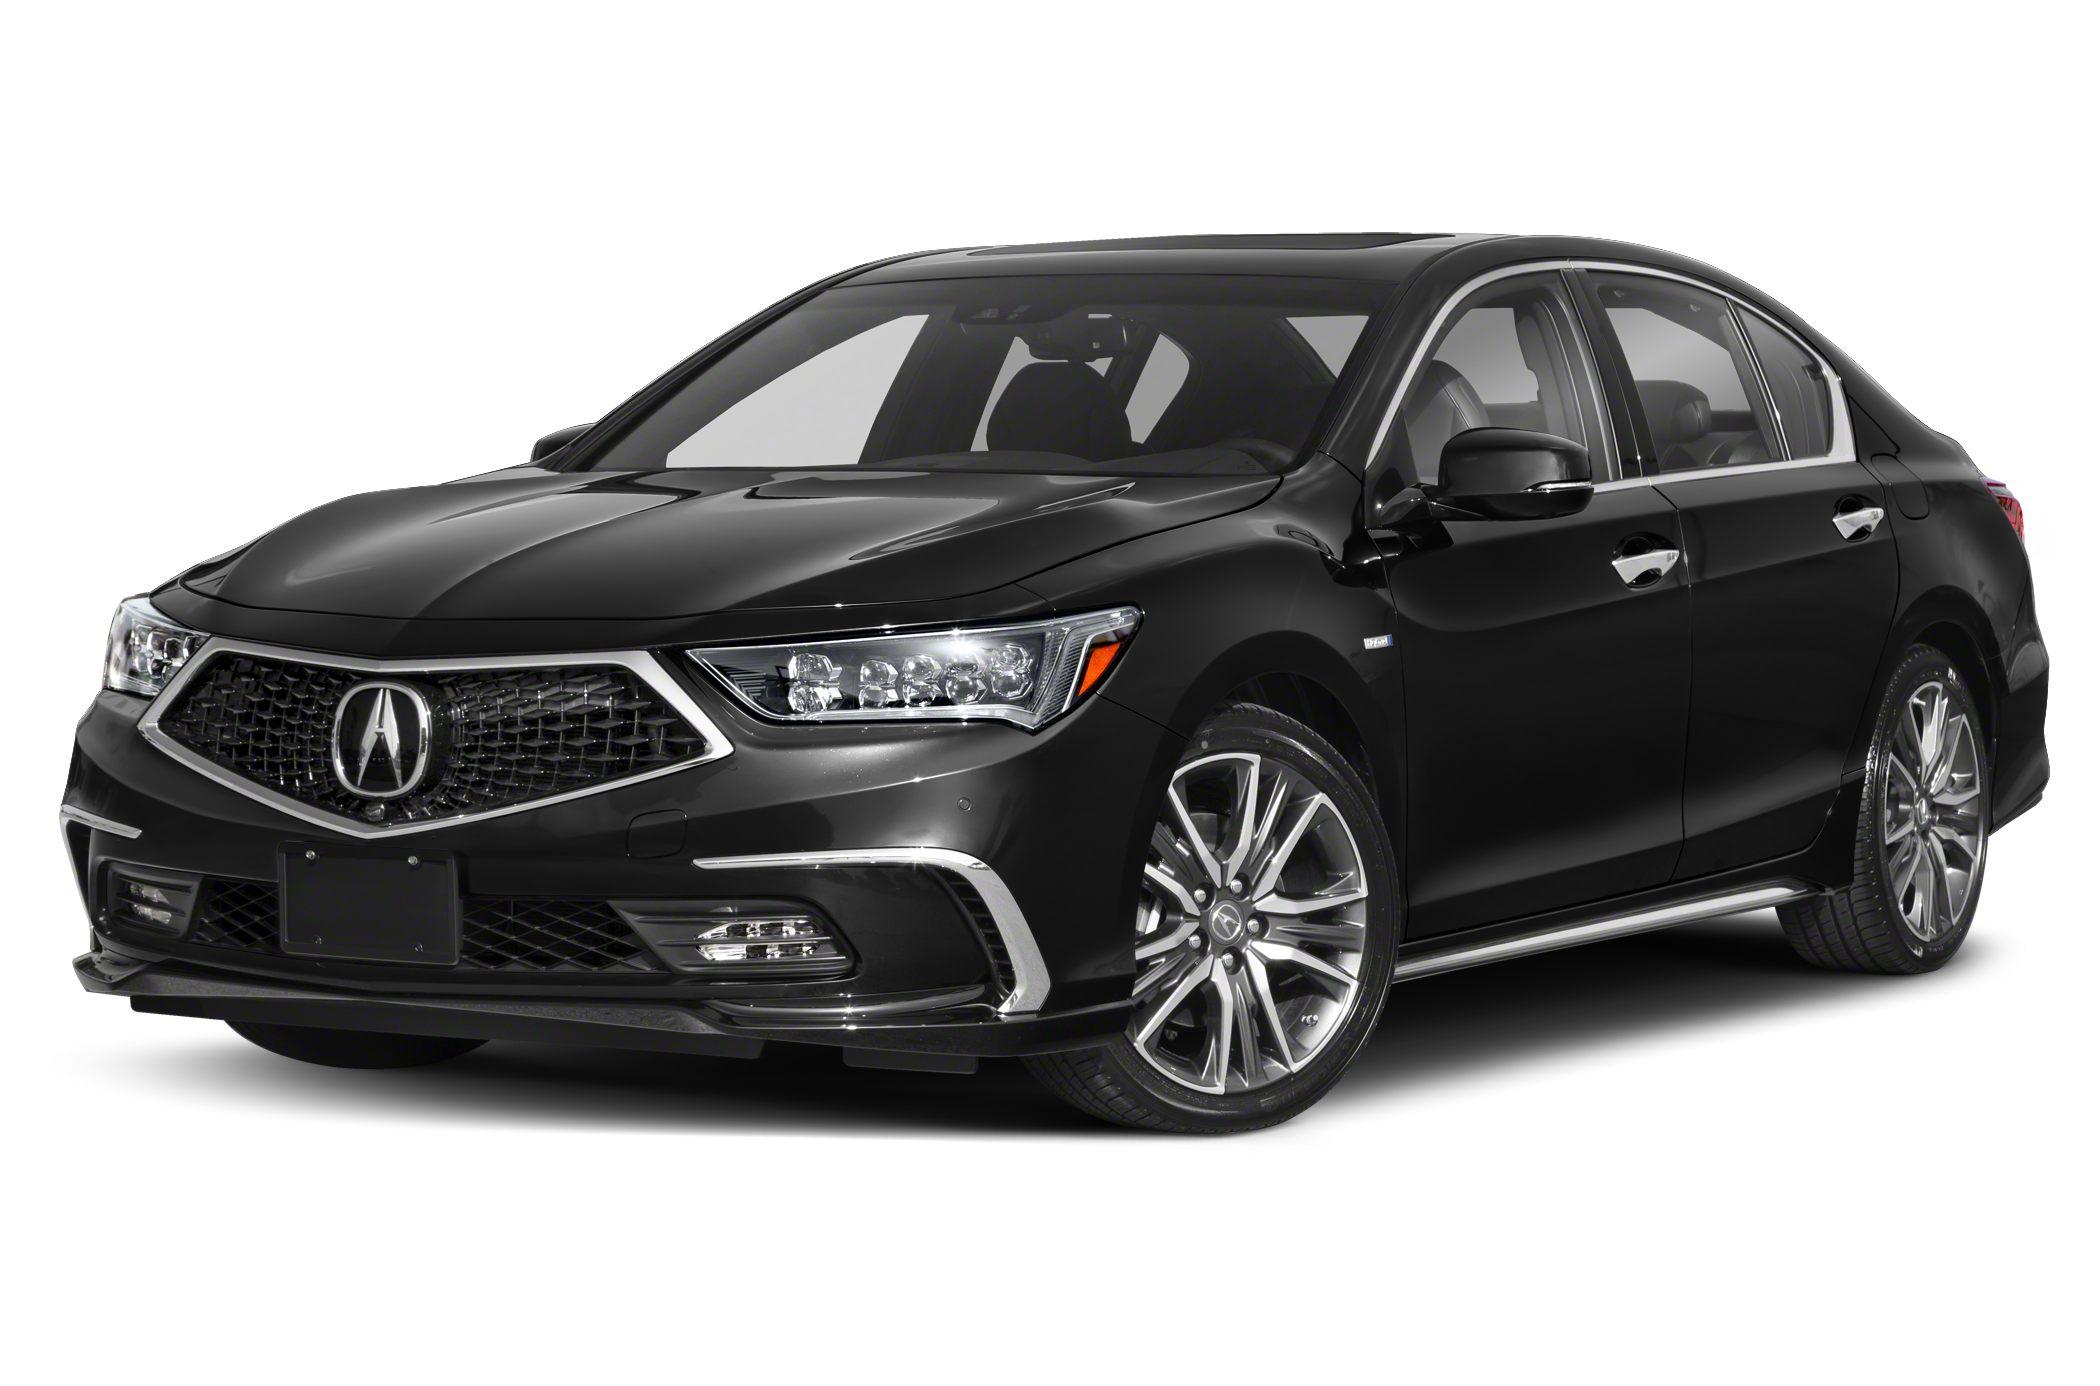 2019 Acura RLX Sport Hybrid Information